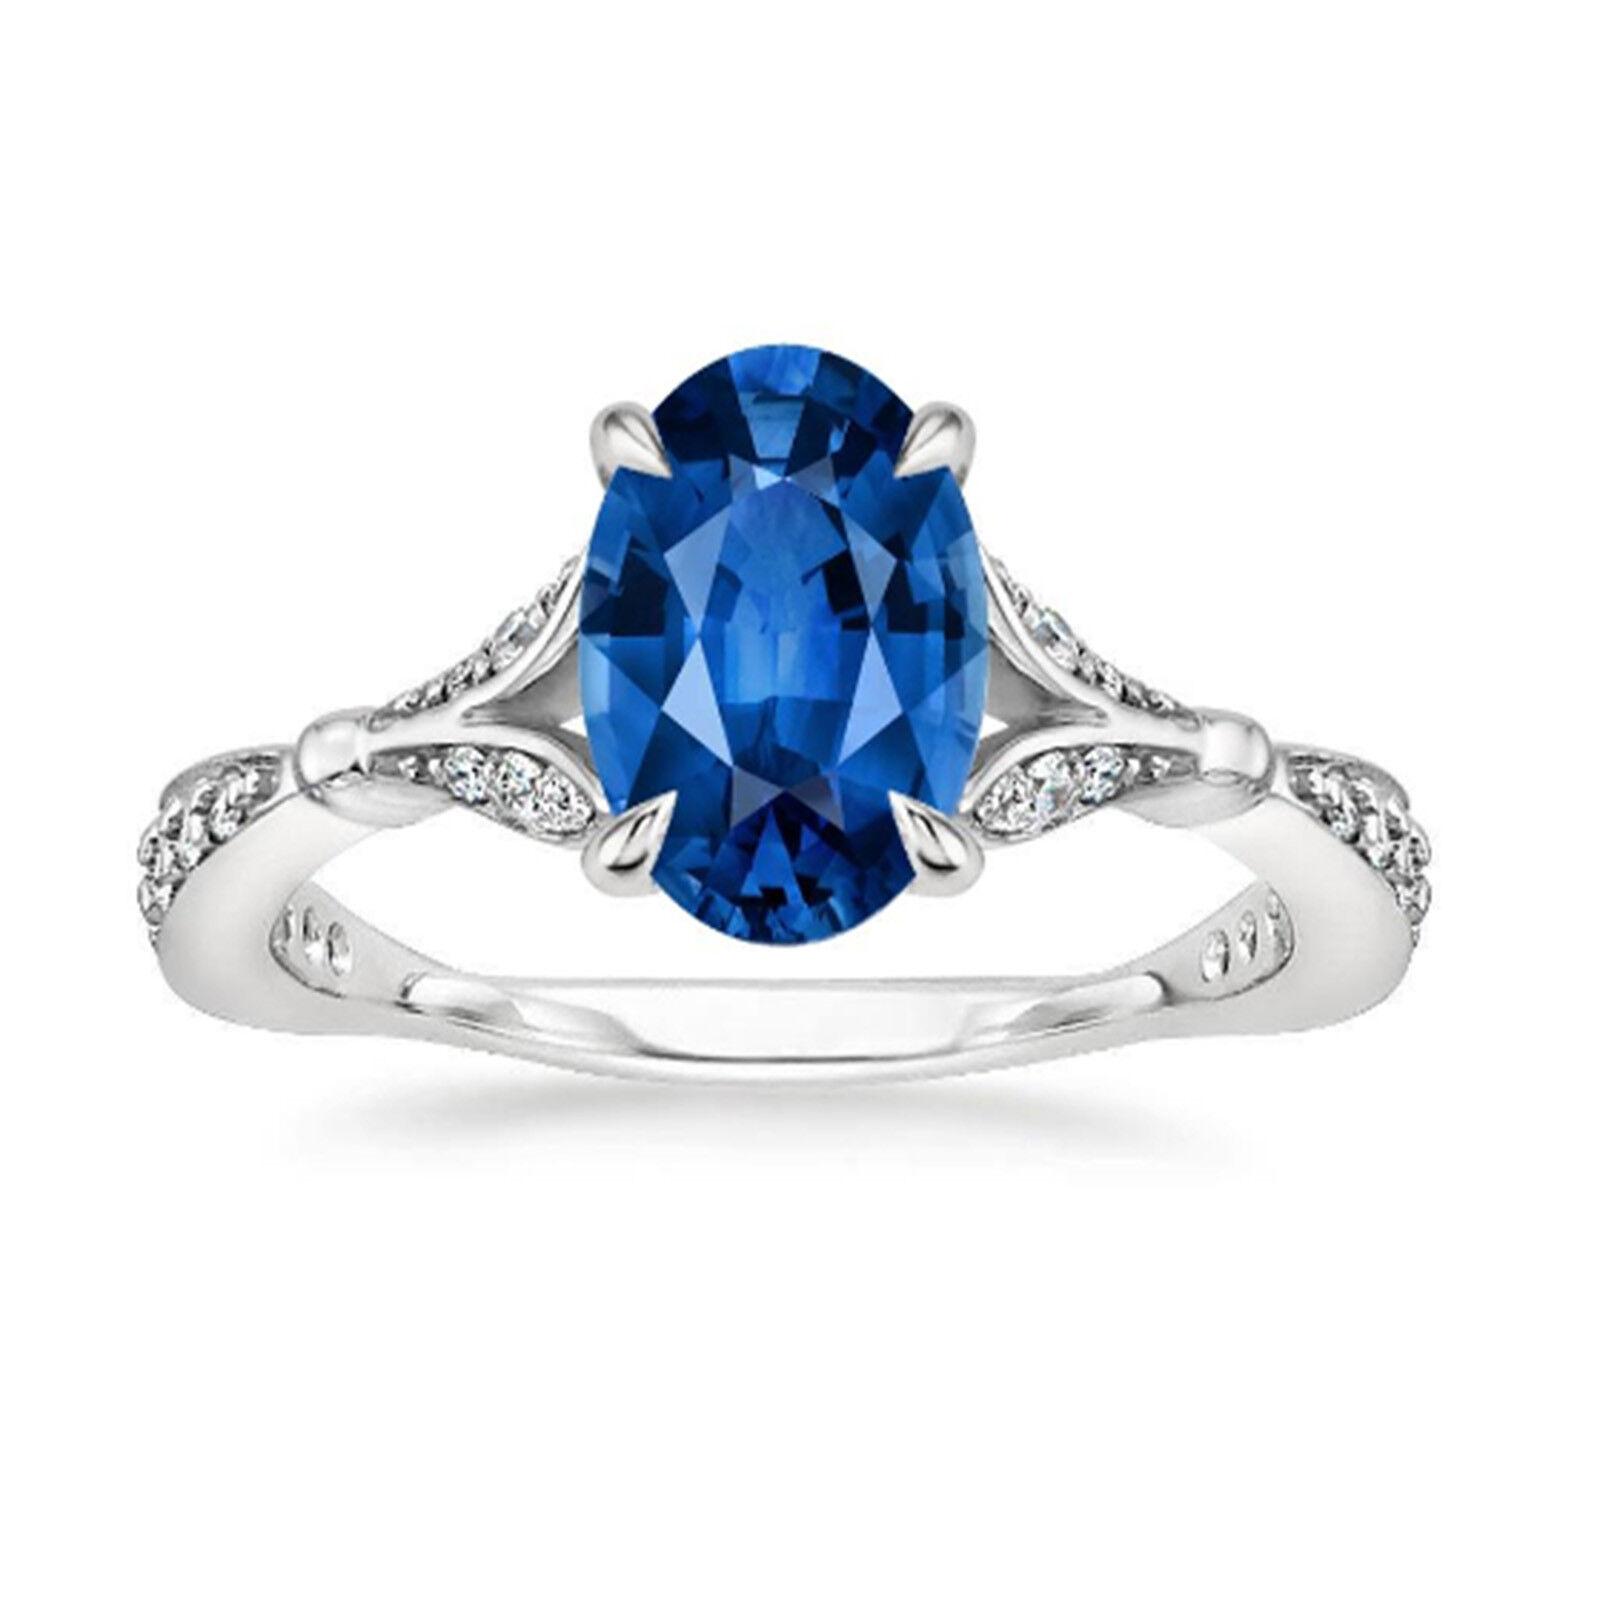 2.56Ct Oval Cut VVS1 Diamond bluee Sapphire Engagement Ring 14K White gold Size 6